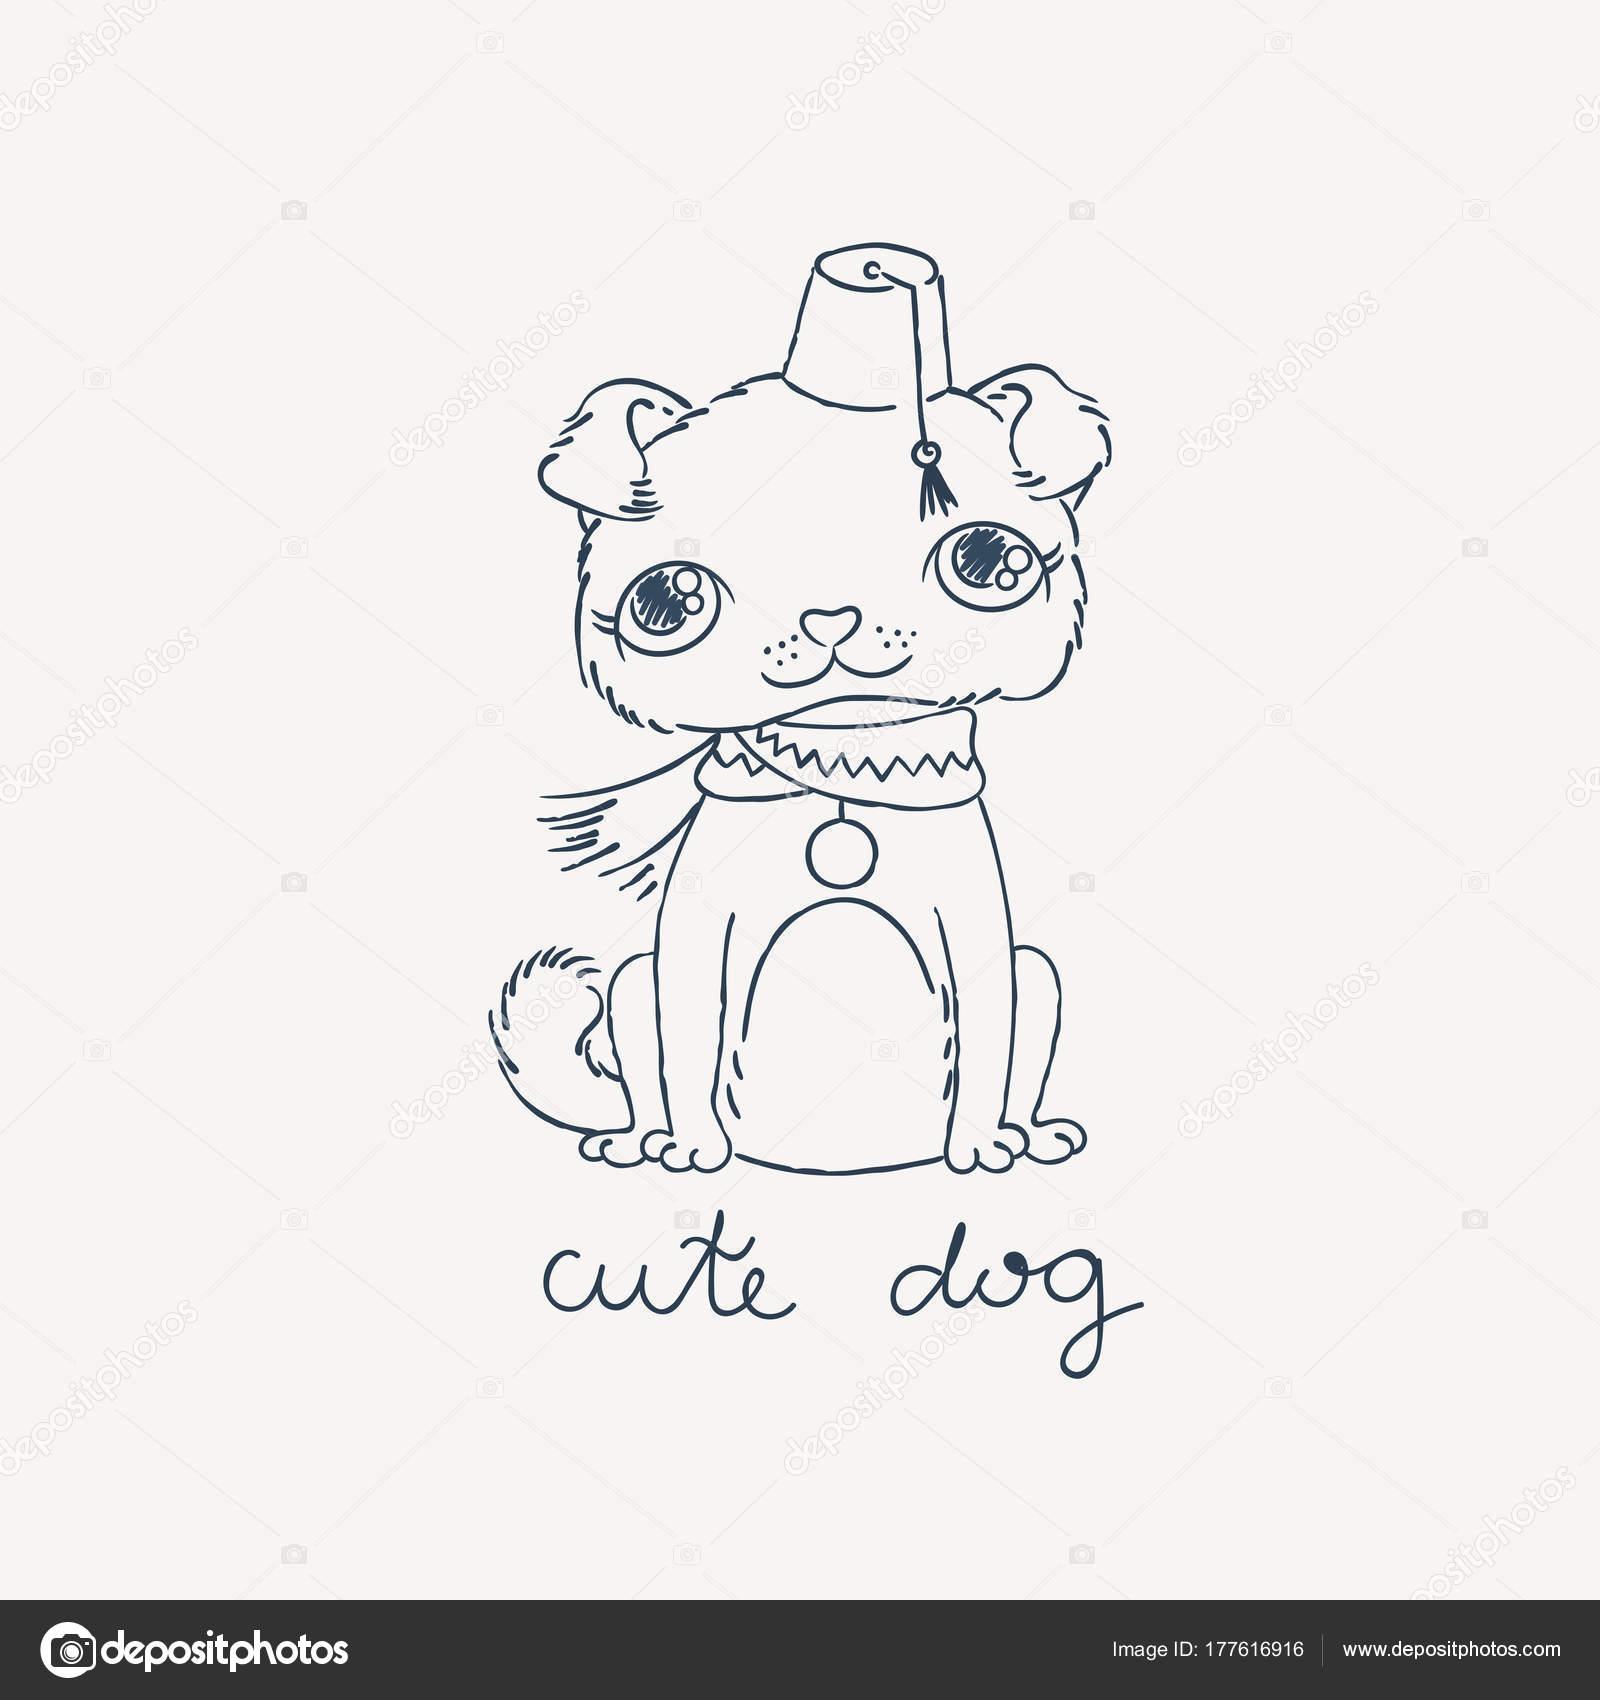 Pug cachorro en fez con una borla. Libros para colorear o imprimir ...